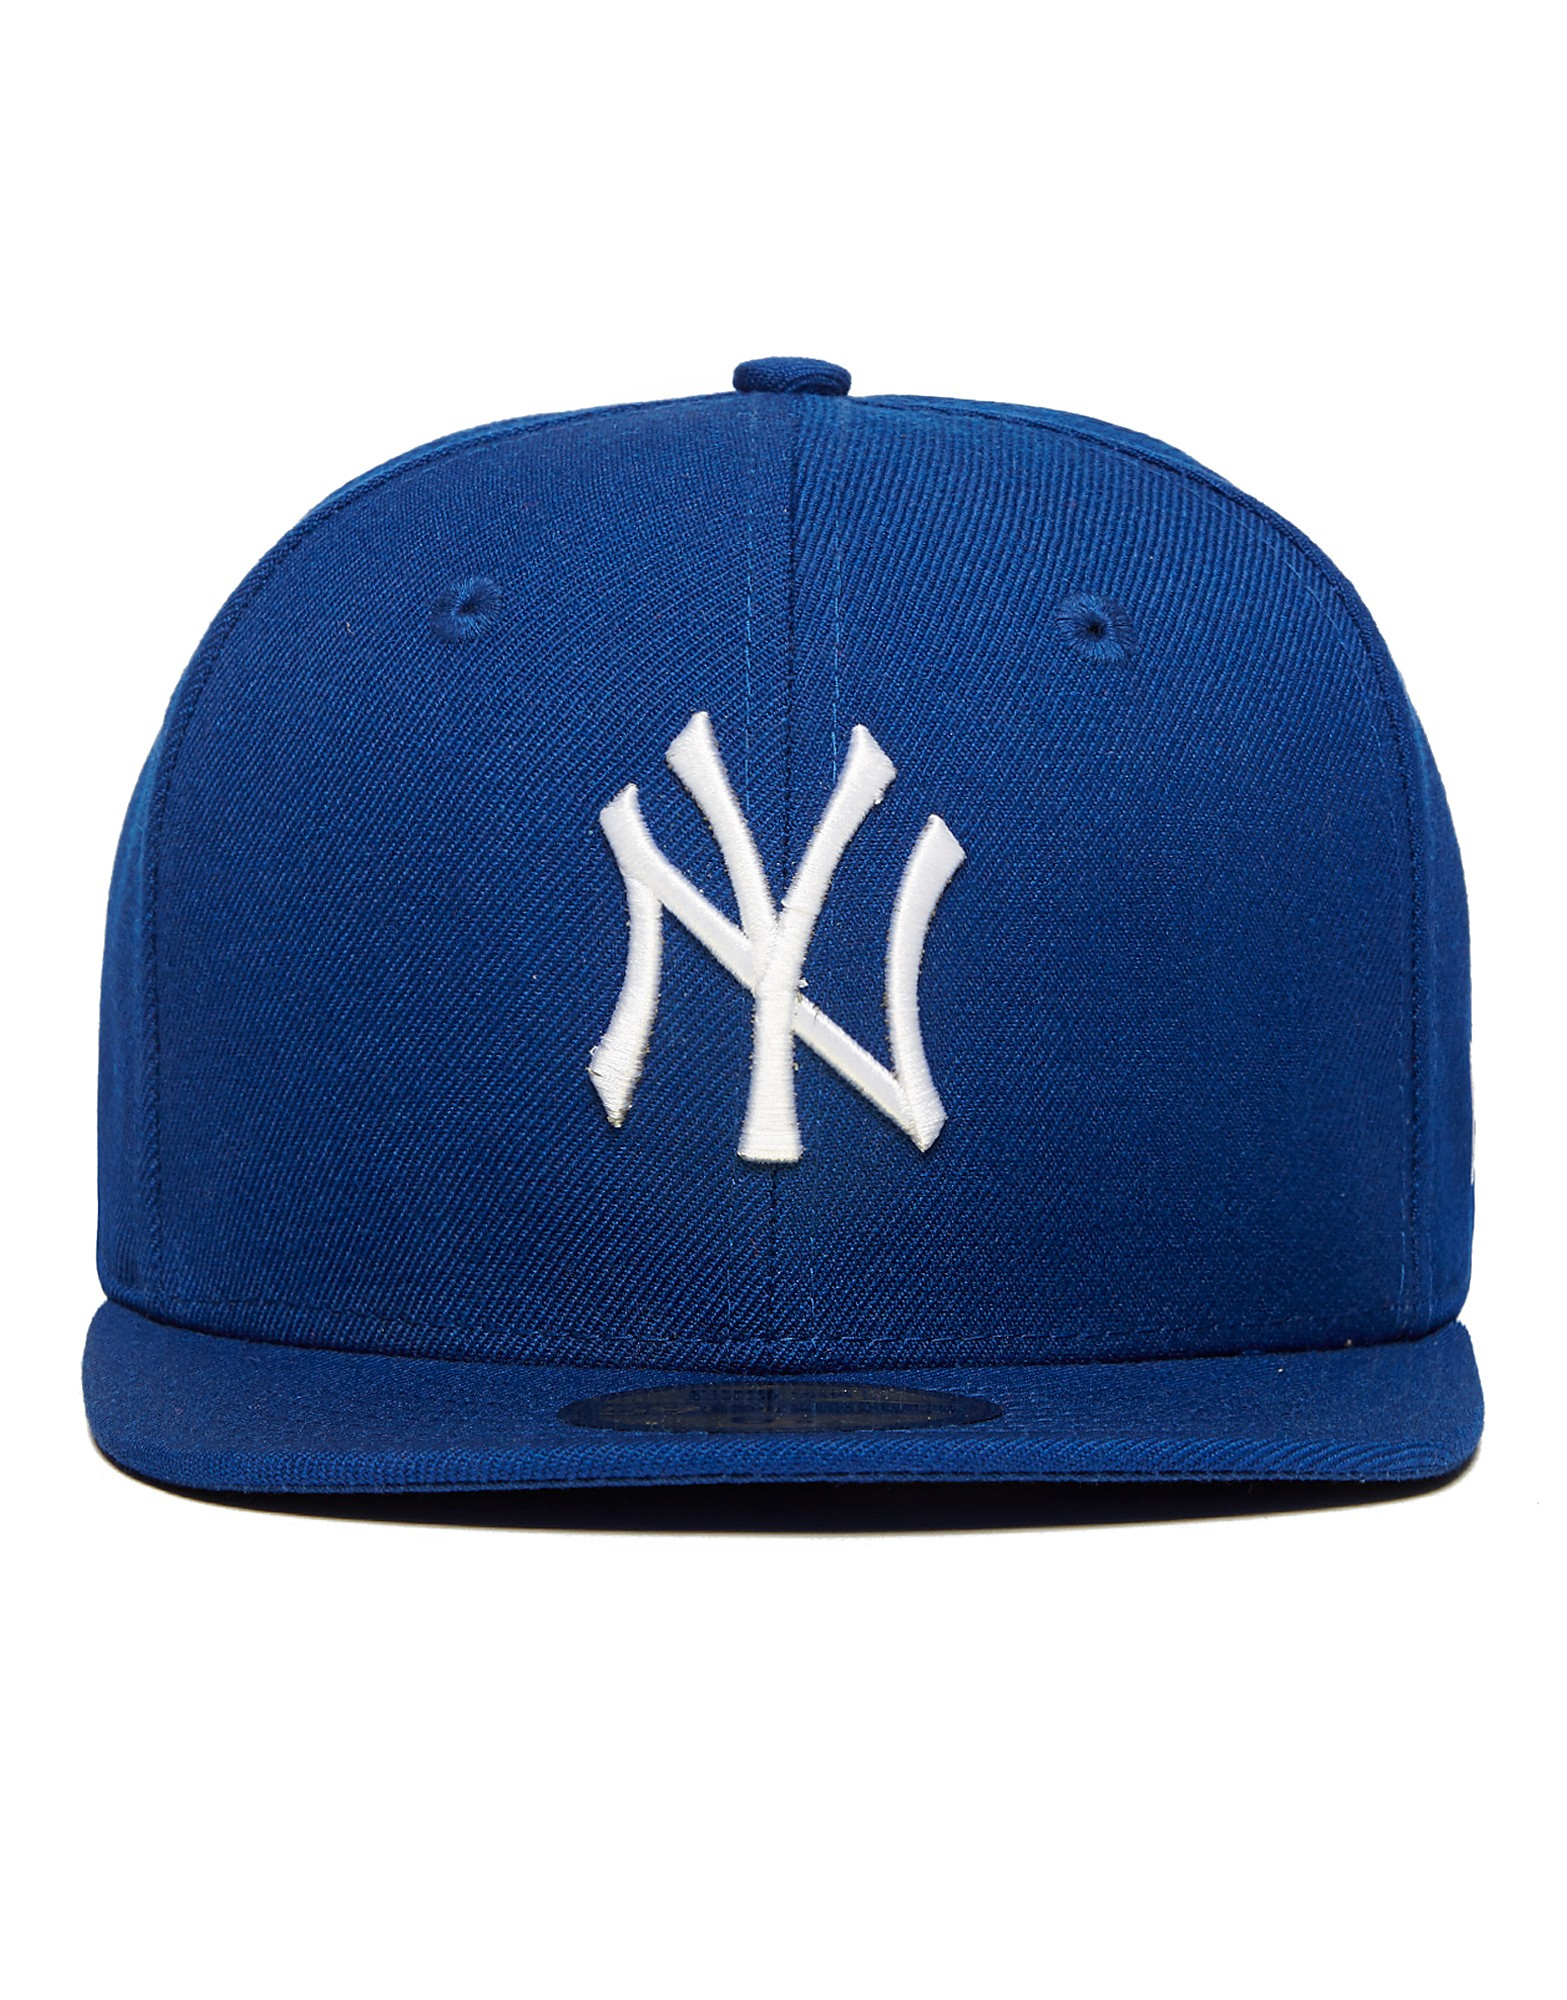 New Era Casquette ajustée New York Yankees 59FIFTY MLB